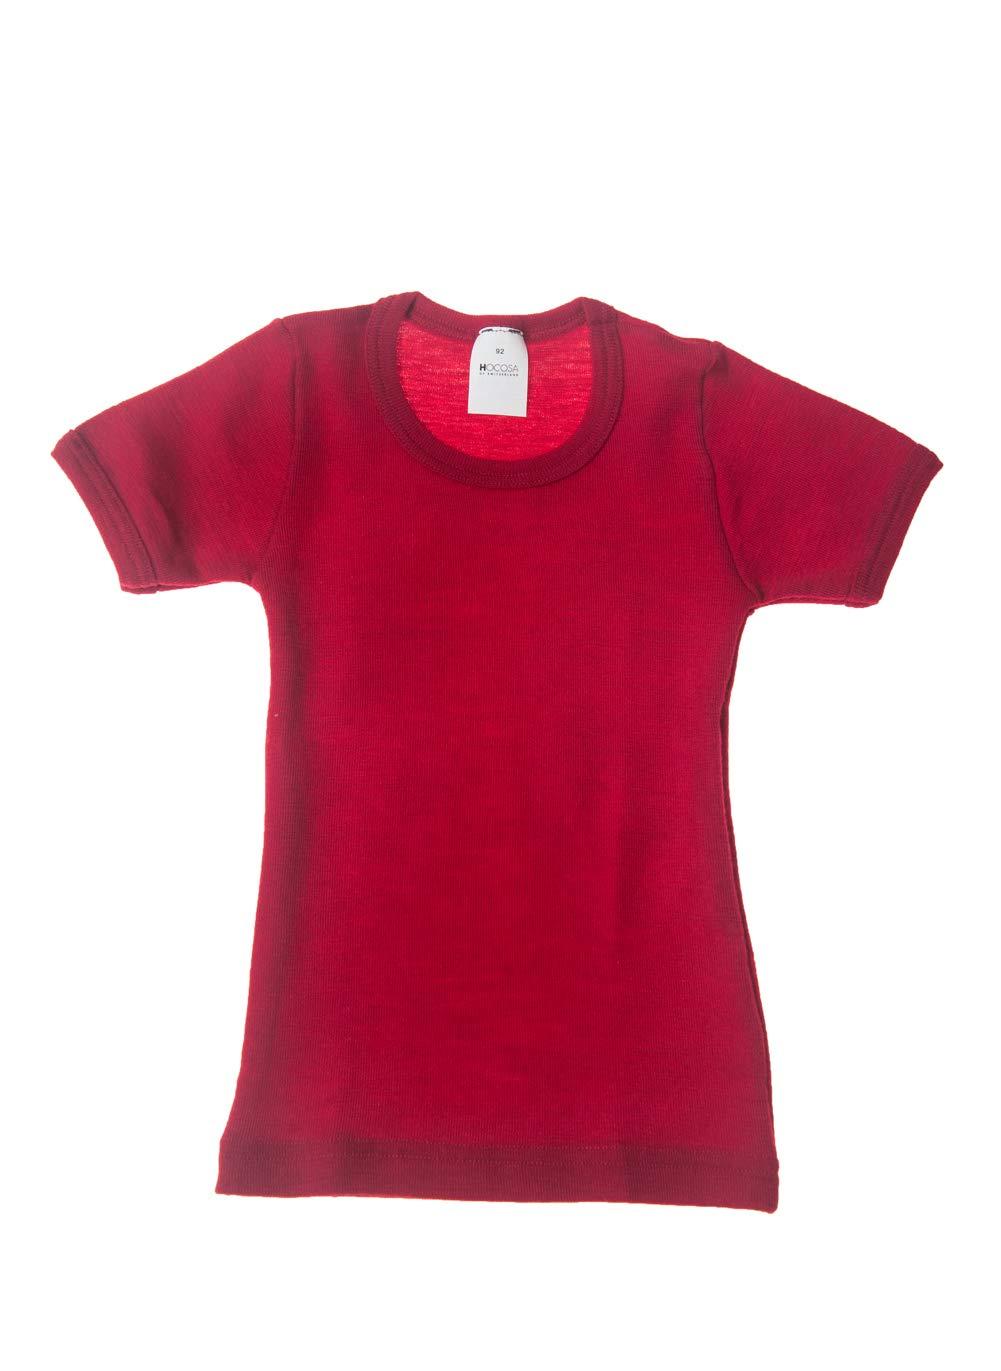 Hocosa of Switzerland Big Kids Organic Wool Short-Sleeved Undershirt, Solid Red, s.164/14 yr by Hocosa of Switzerland